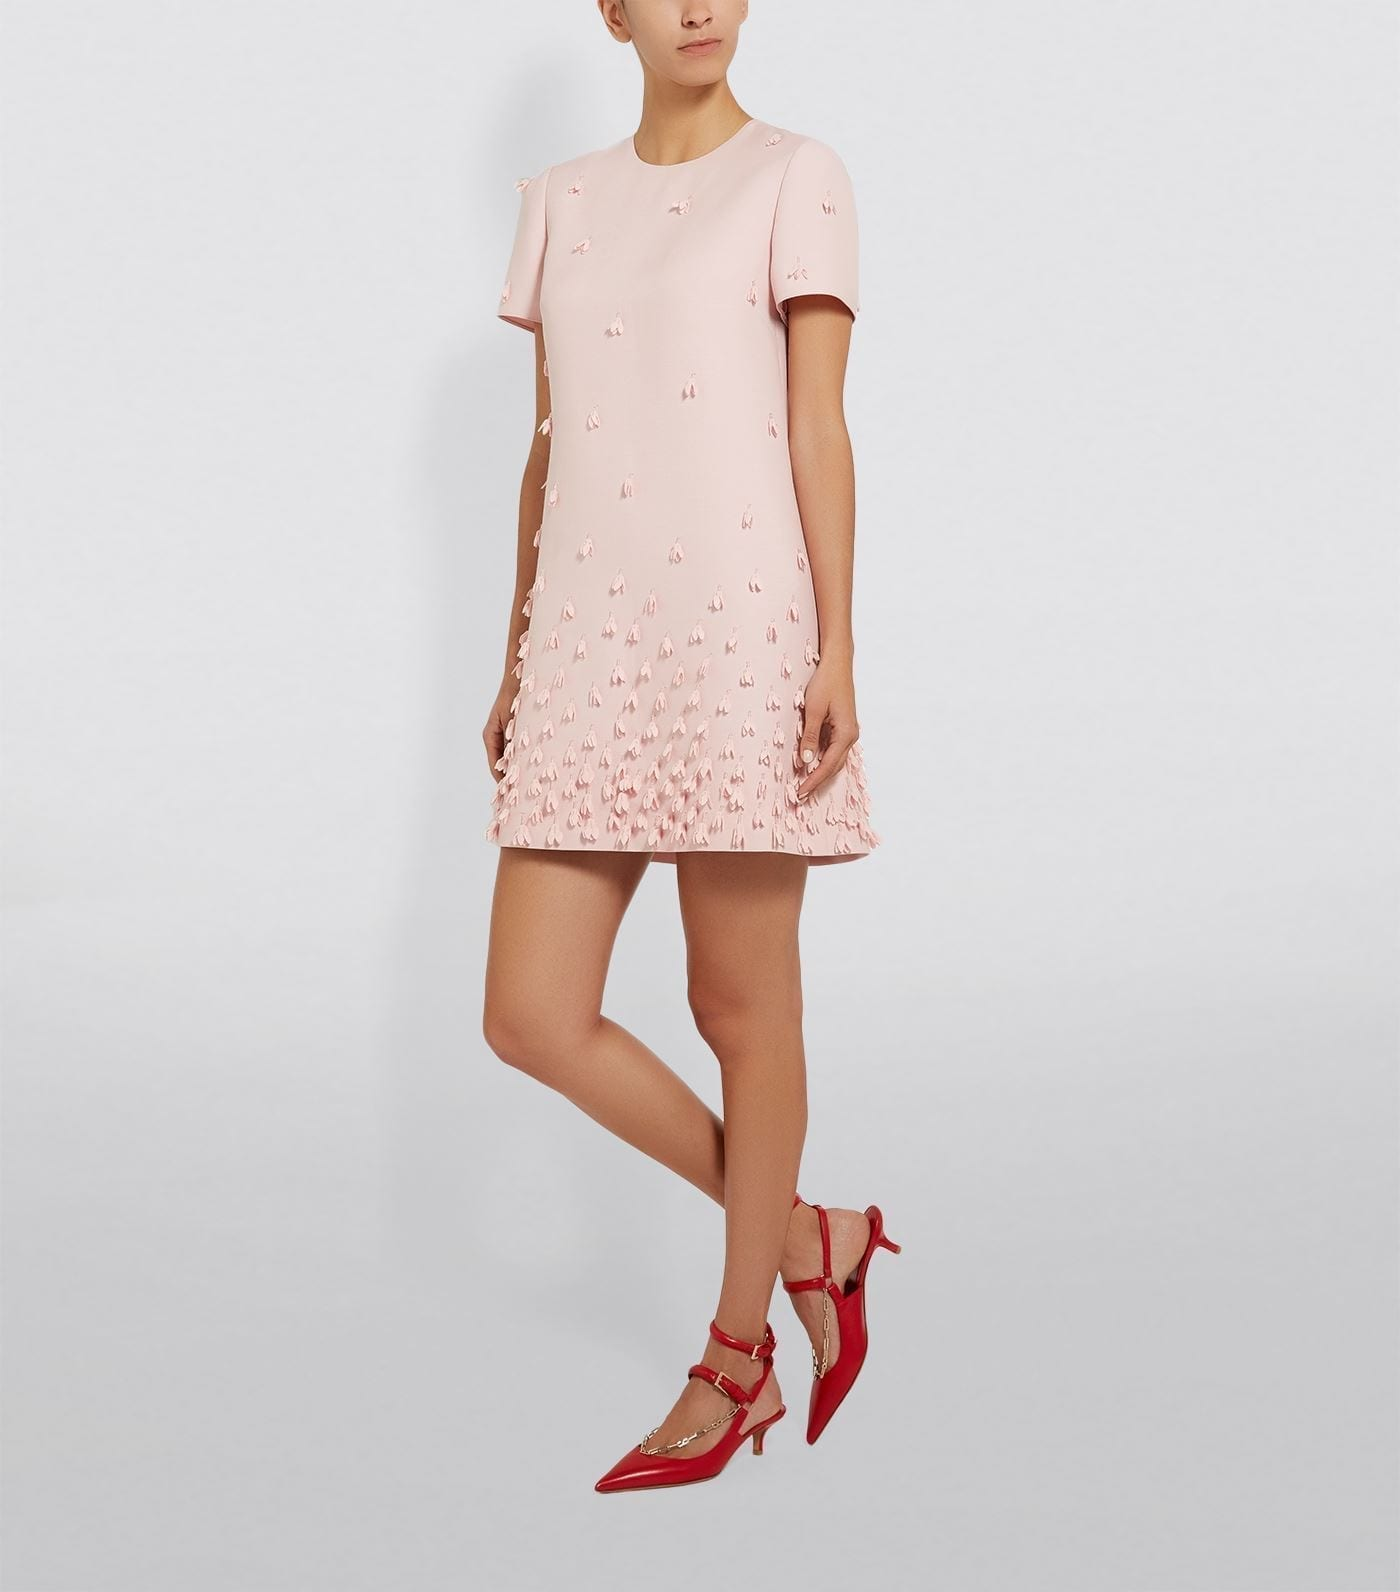 VALENTINO Snowdrop Shift Dress